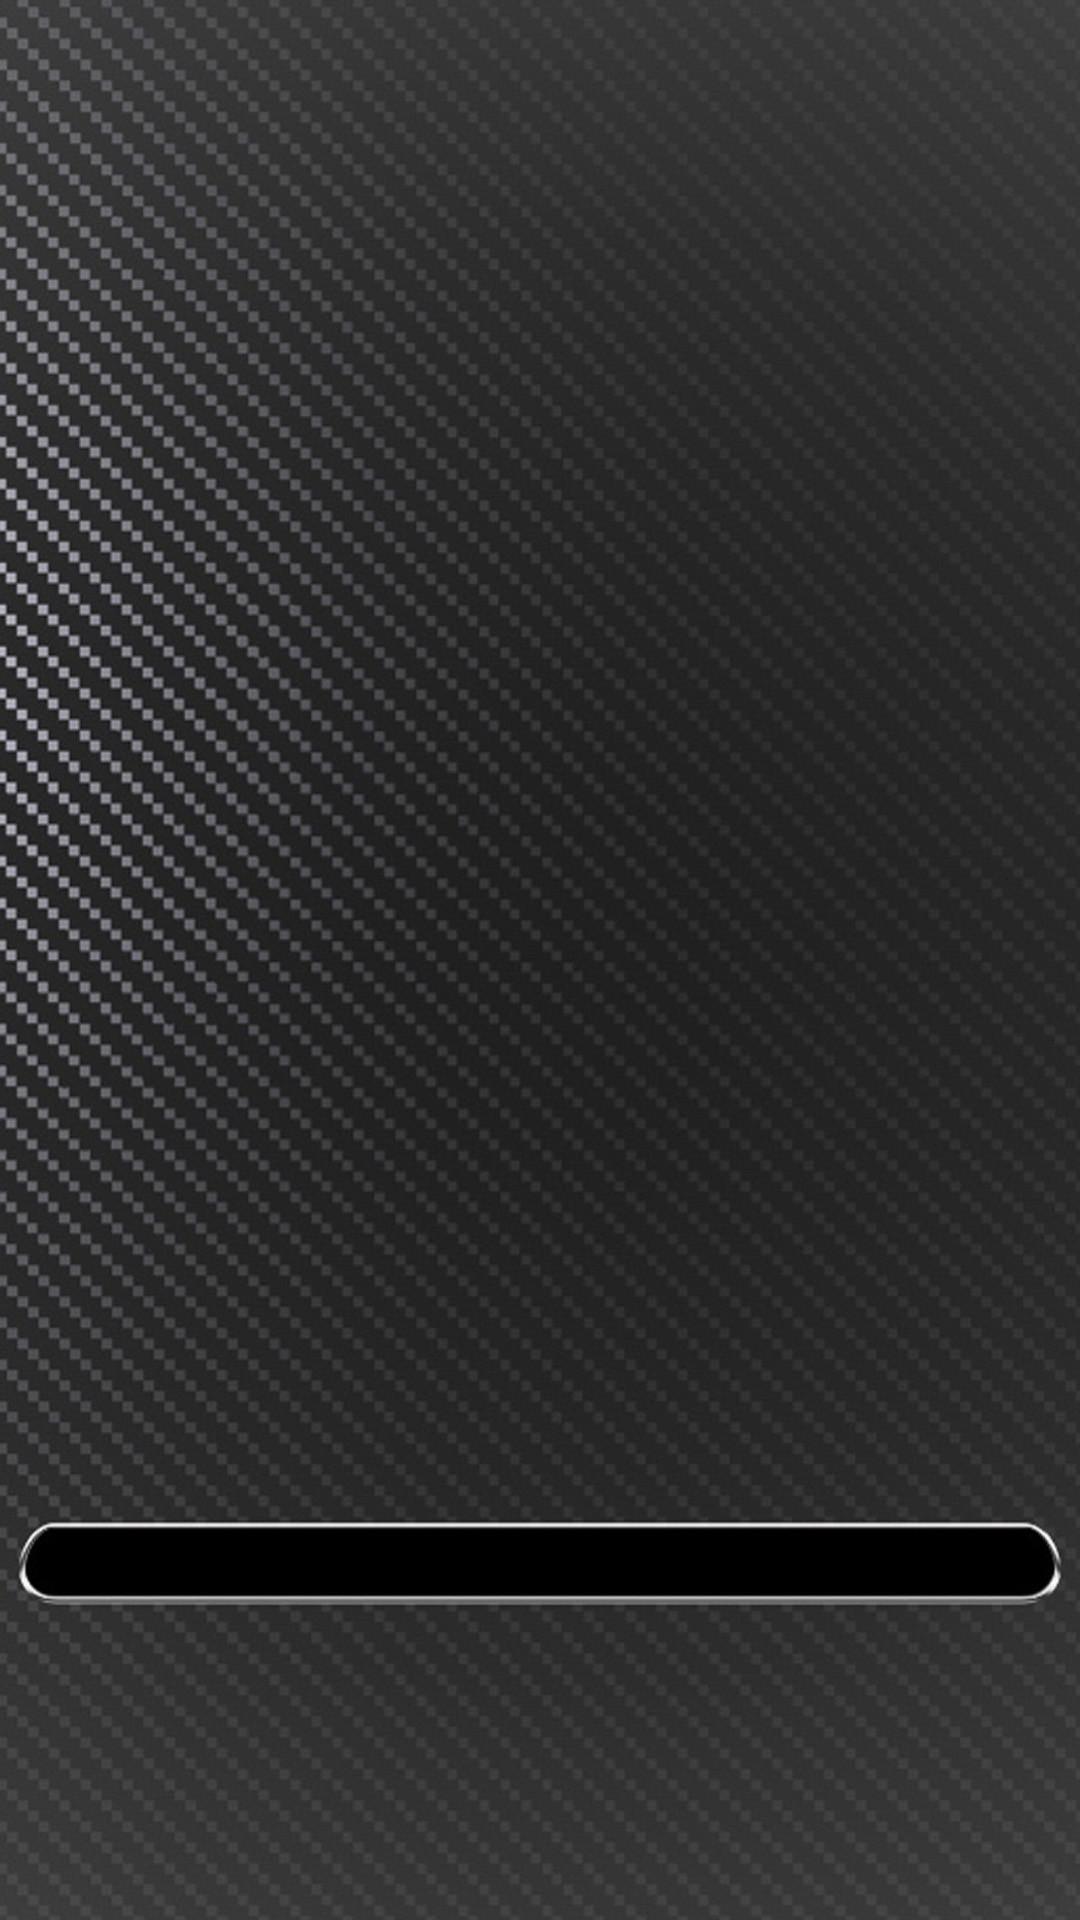 Res: 1080x1920, Carbon Fiber Samsung Wallpapers Samsung Galaxy S5 Galaxy S4 Galaxy